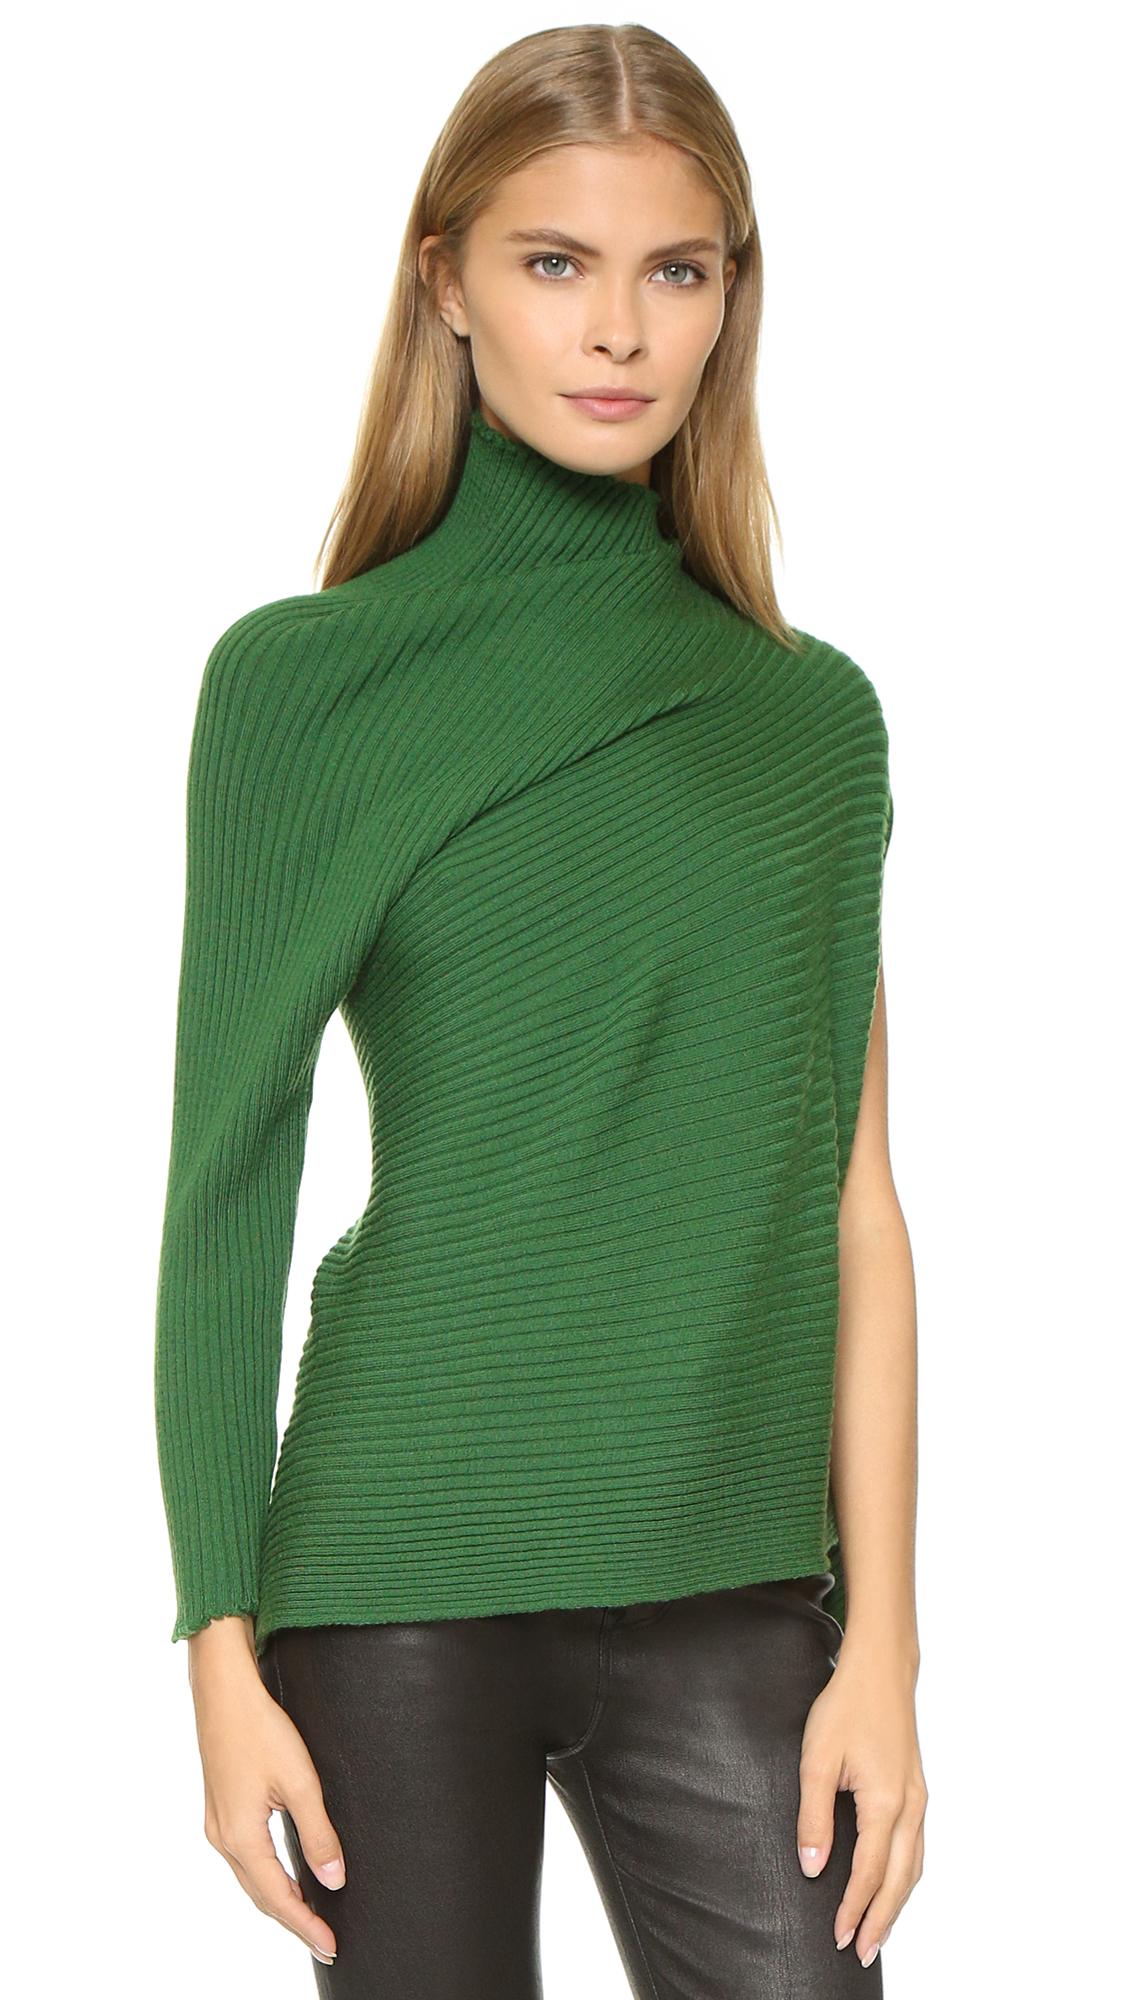 Express Turtleneck Sweater